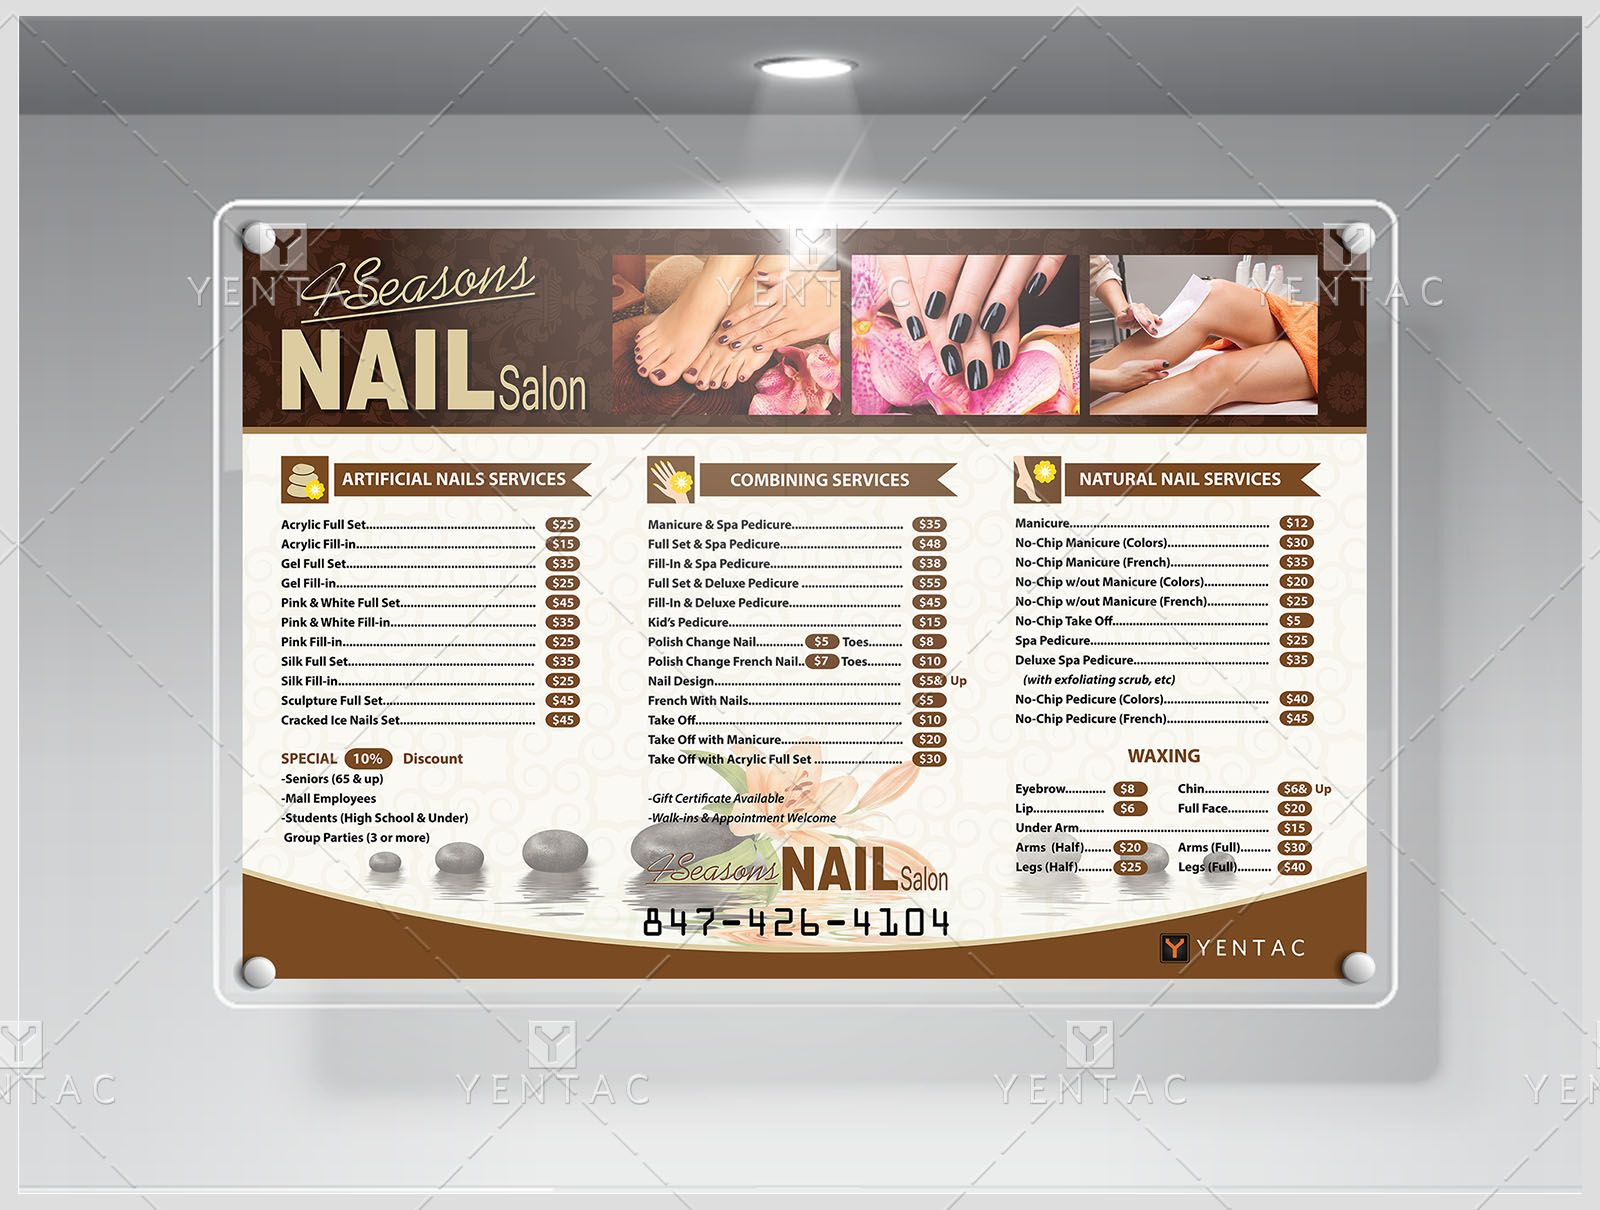 product-5100-4-seasons-nail-salon-price-list-yentac | Nail Salon ...